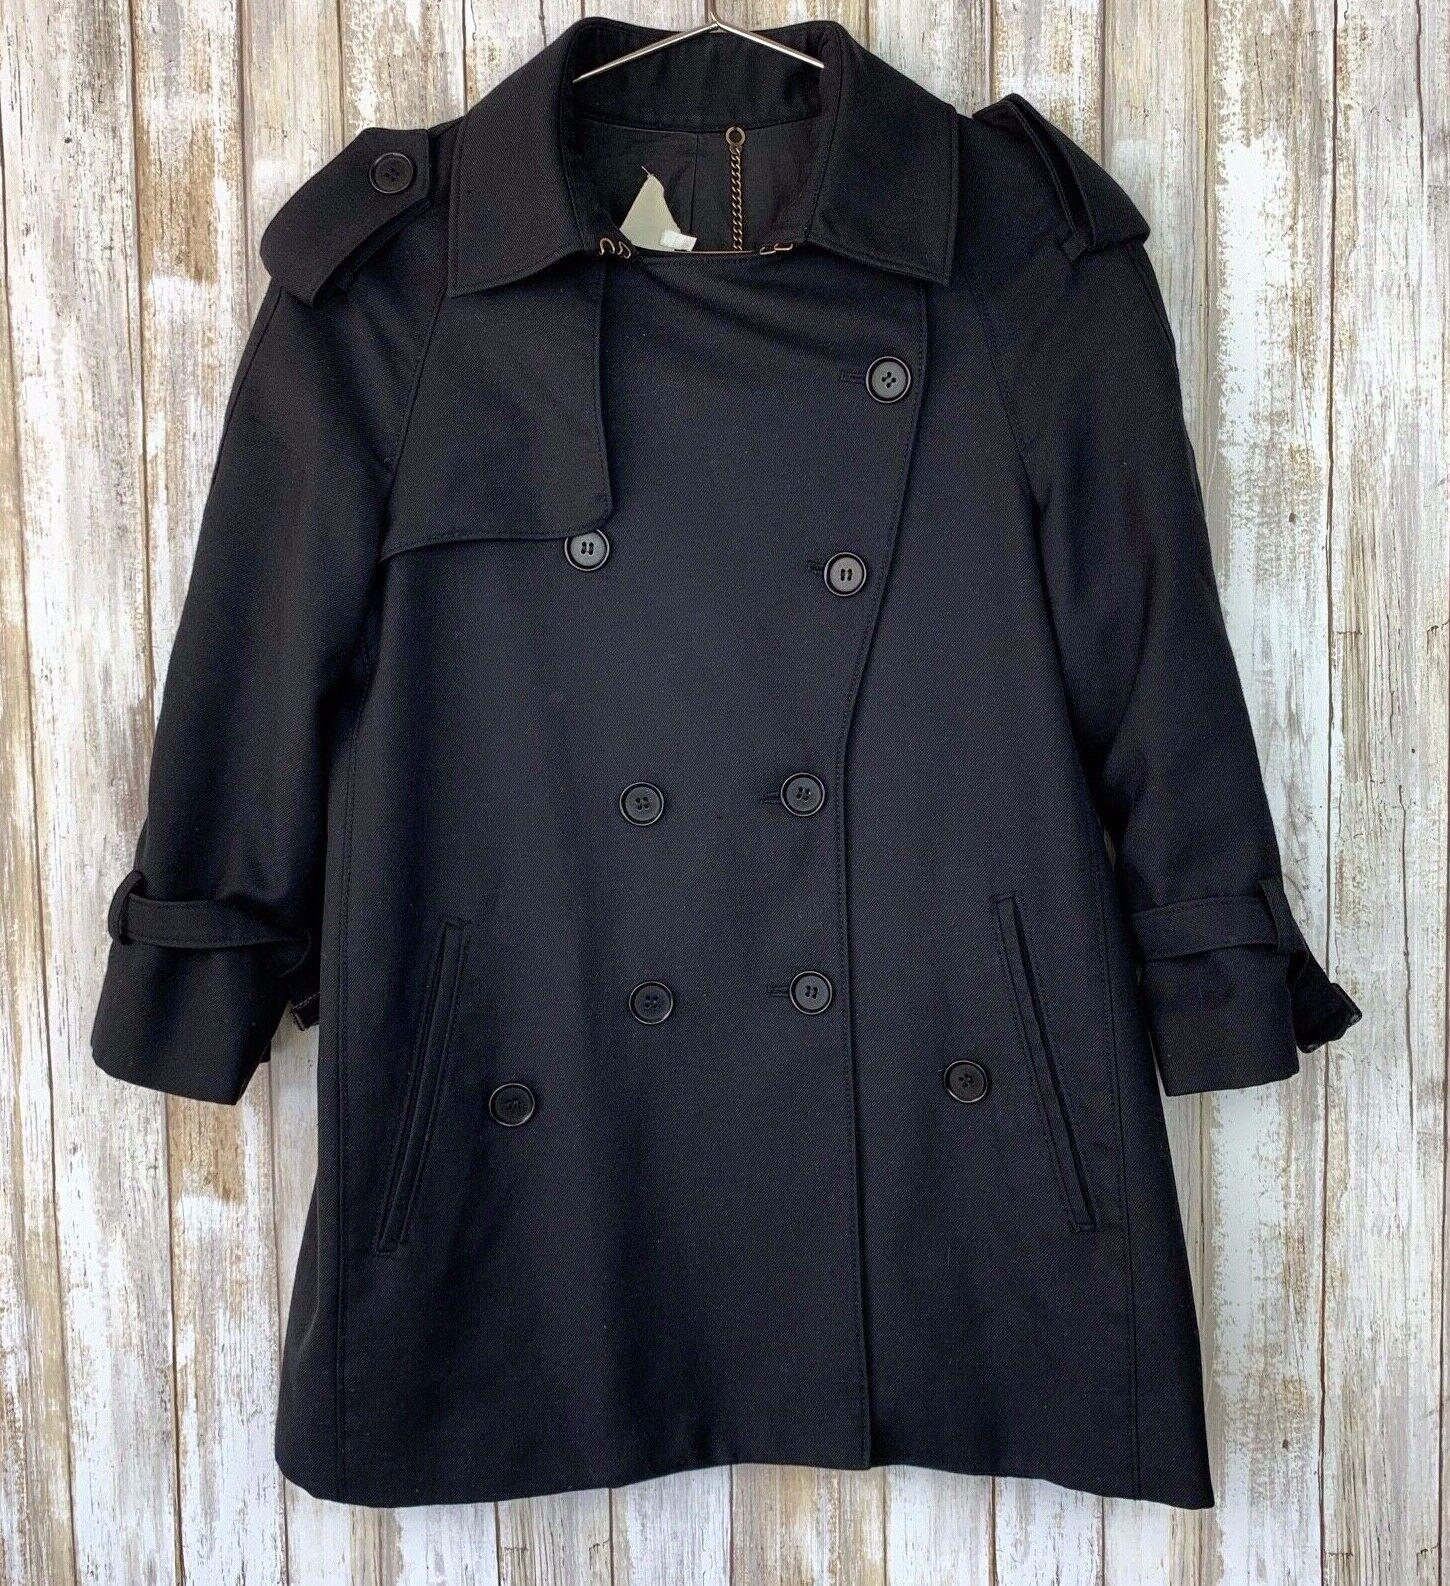 PHILLIP LIM 3.1 Black Thin Button Wool A-line Jacket Coat 2 S Small Vintage VTG